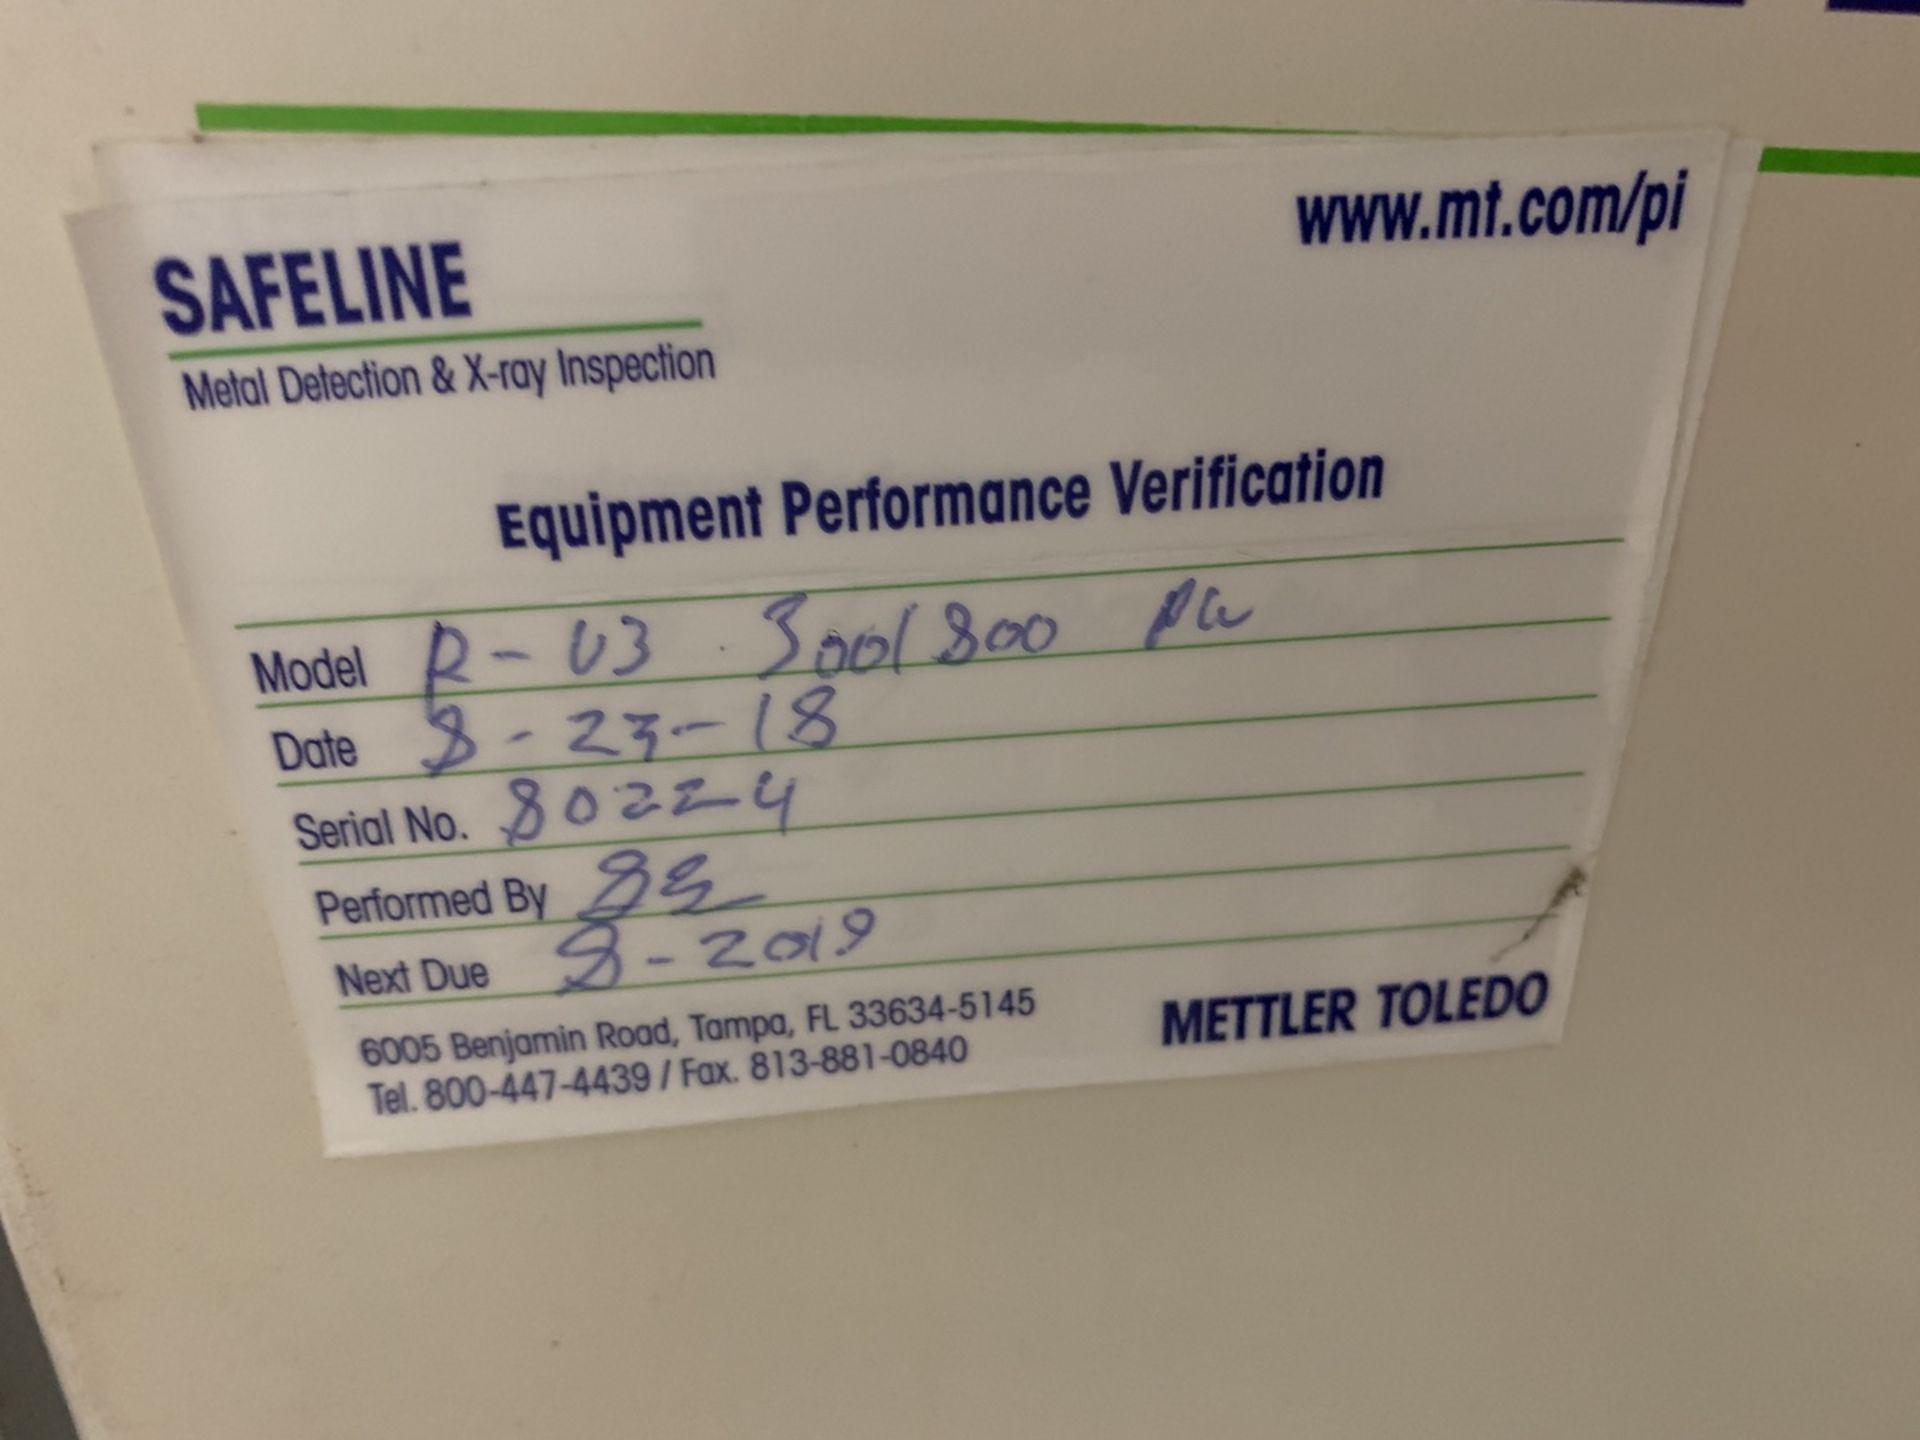 "Lot 6 - Safeline Conveyorized Metal Detector, 18"" x 6"" Apreture, 11 1/2"" x 4 1/2"" Clear wit | Rig Fee: 200"